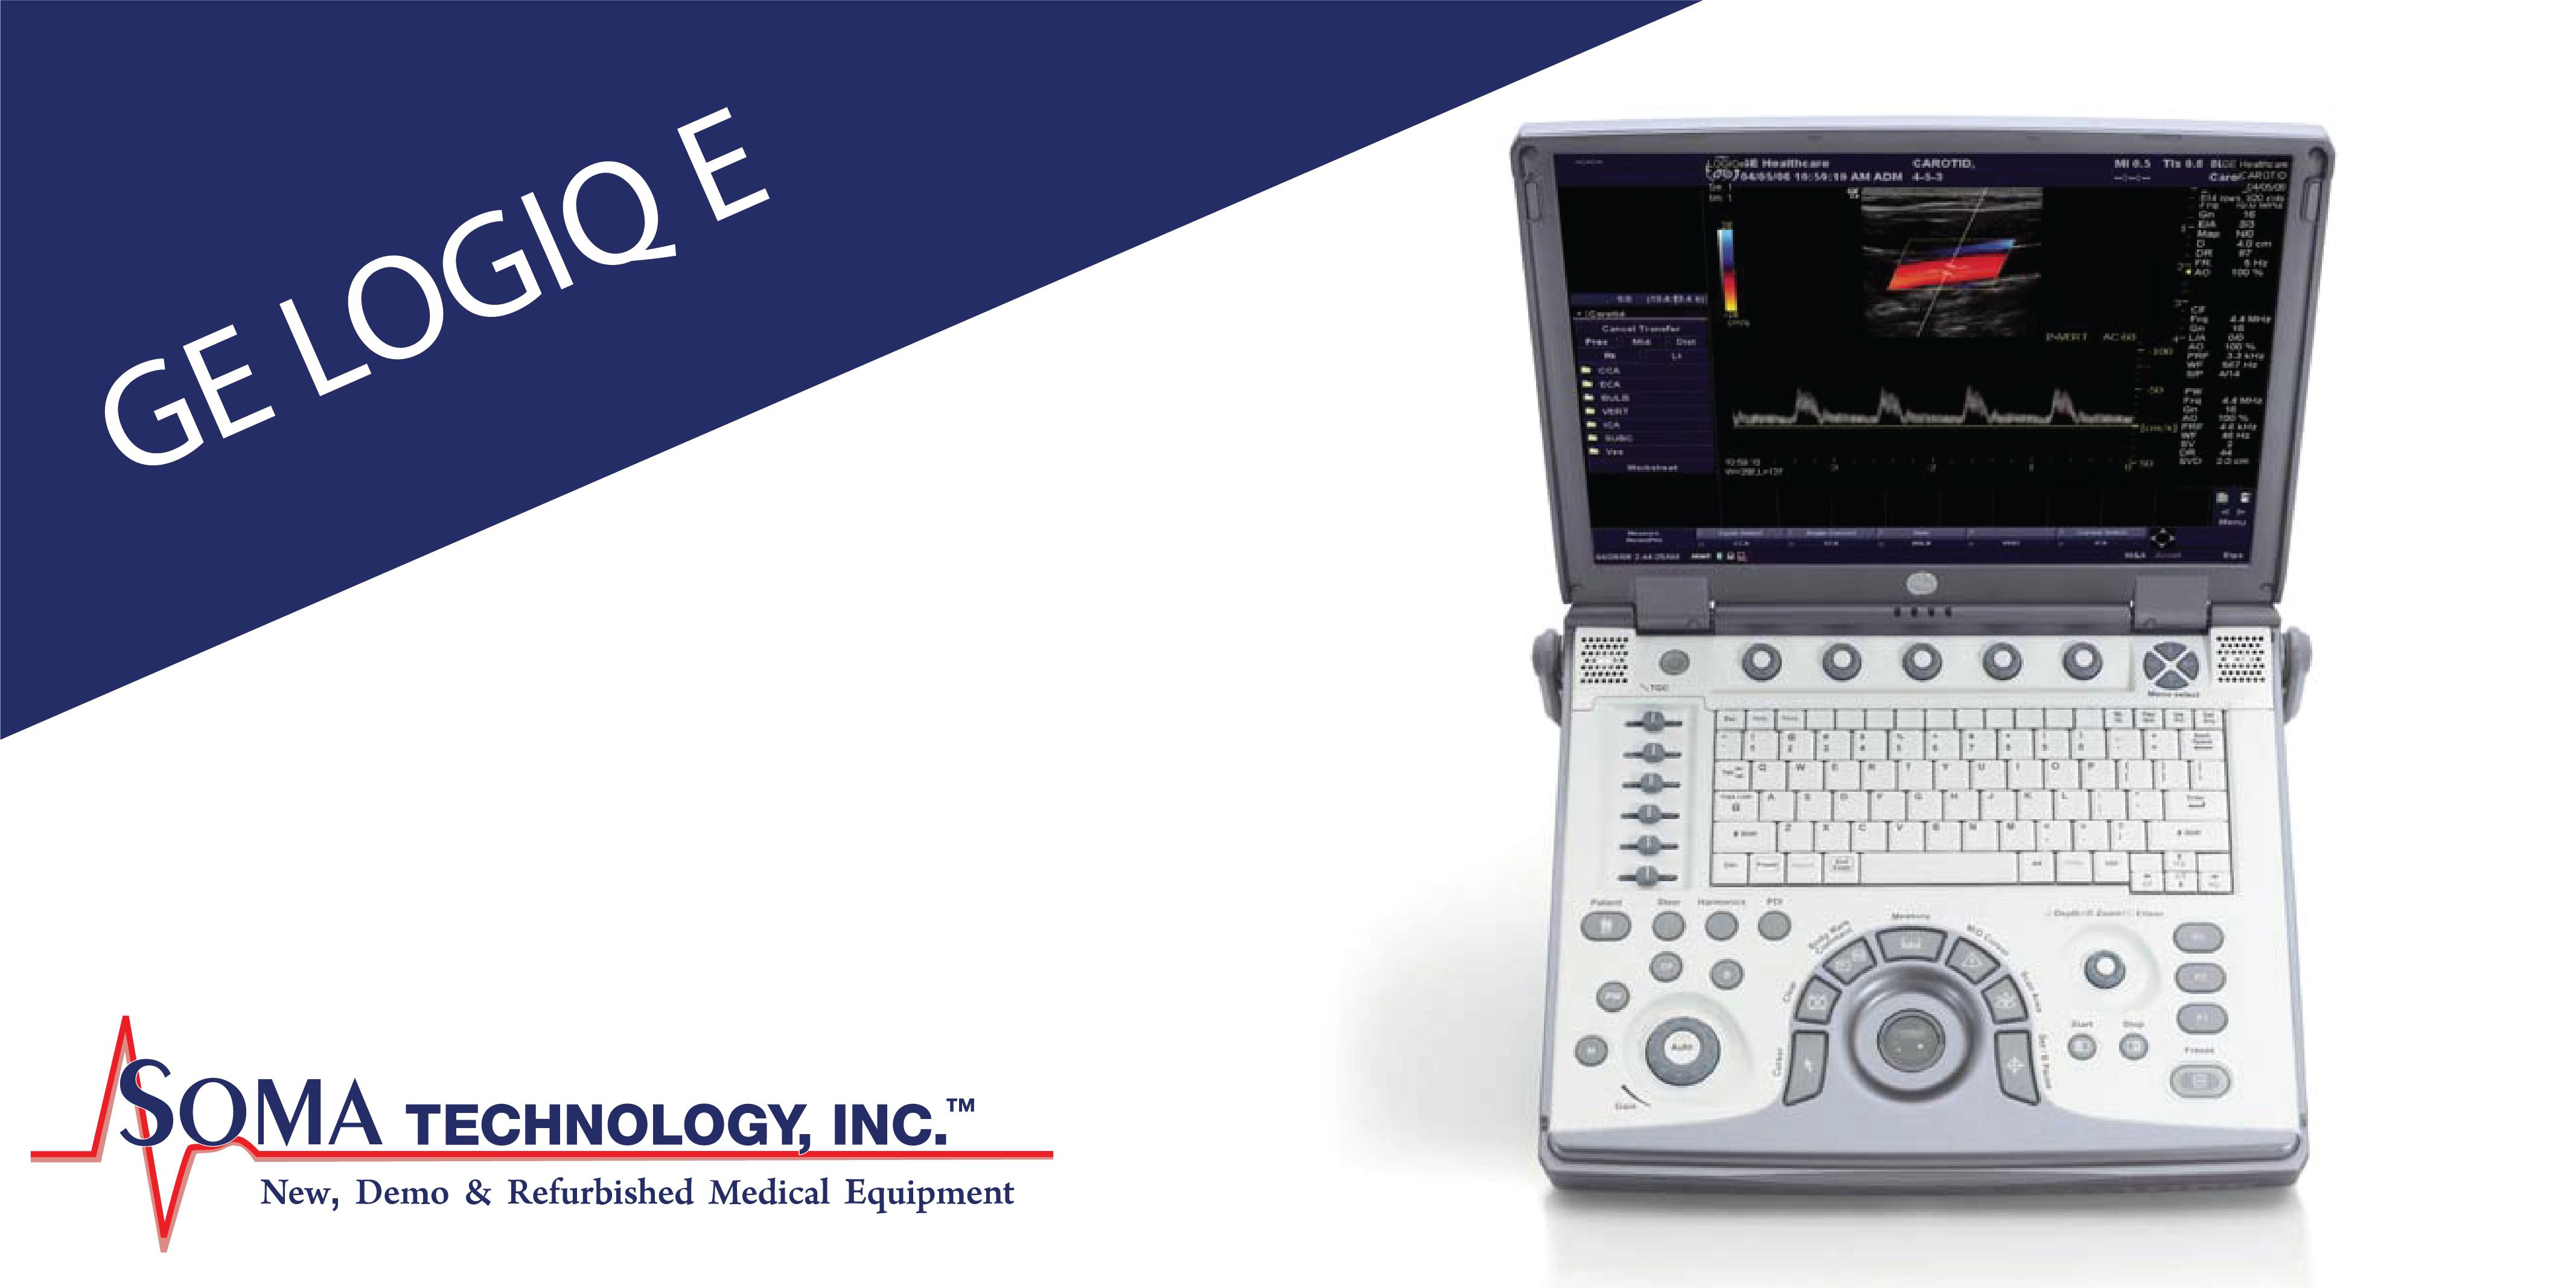 GE LOGIQ E - Portable Ultrasound Machine - Soma Technology, Inc.